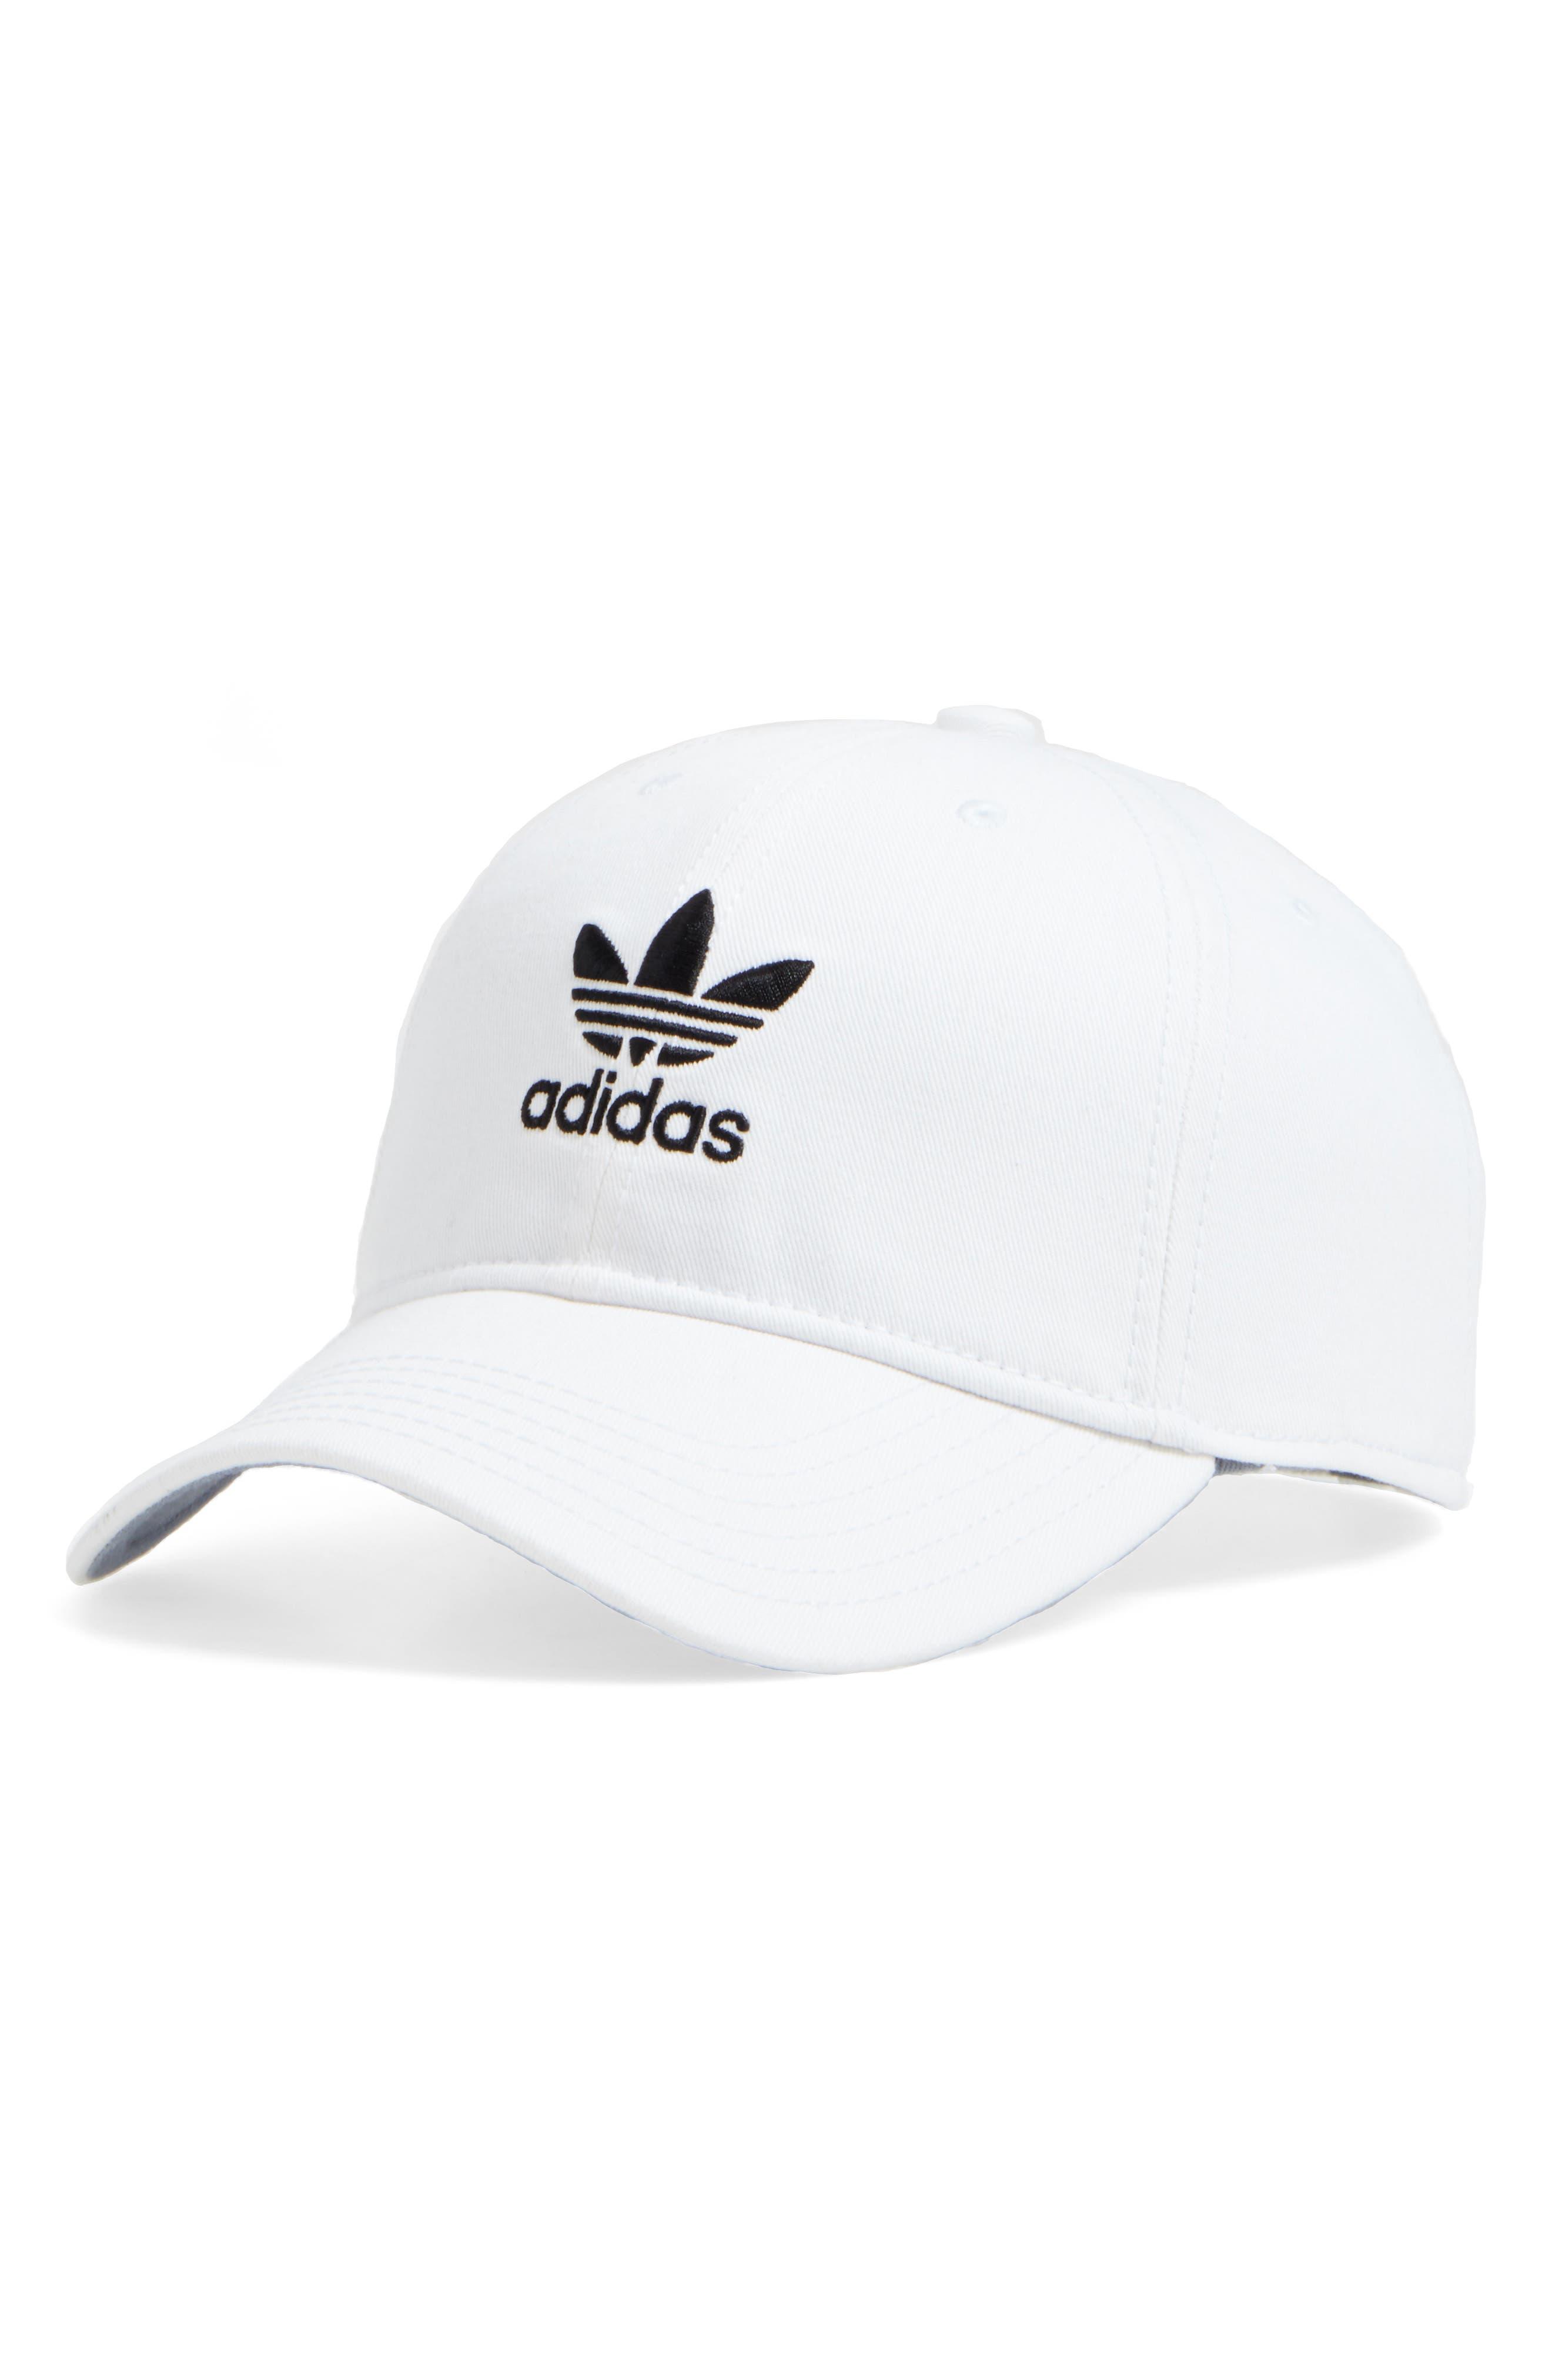 ADIDAS Trefoil Baseball Cap, Main, color, WHITE